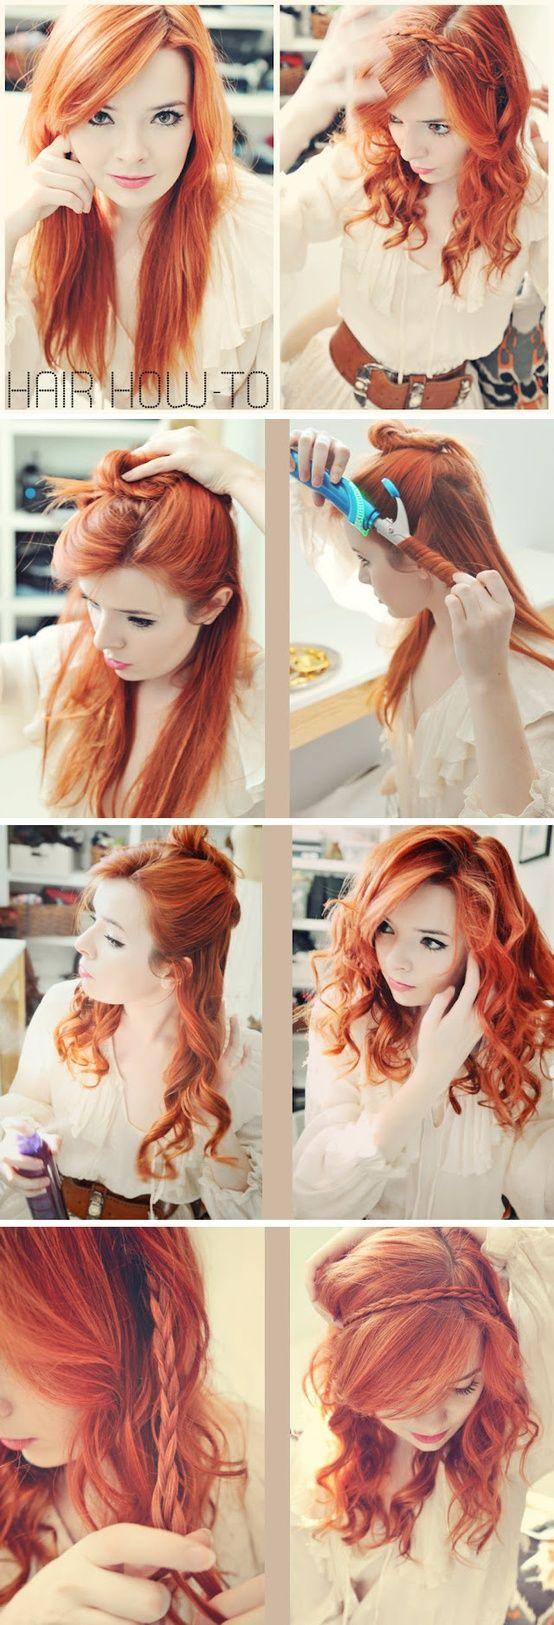 best peinados images on pinterest cute hairstyles hair makeup